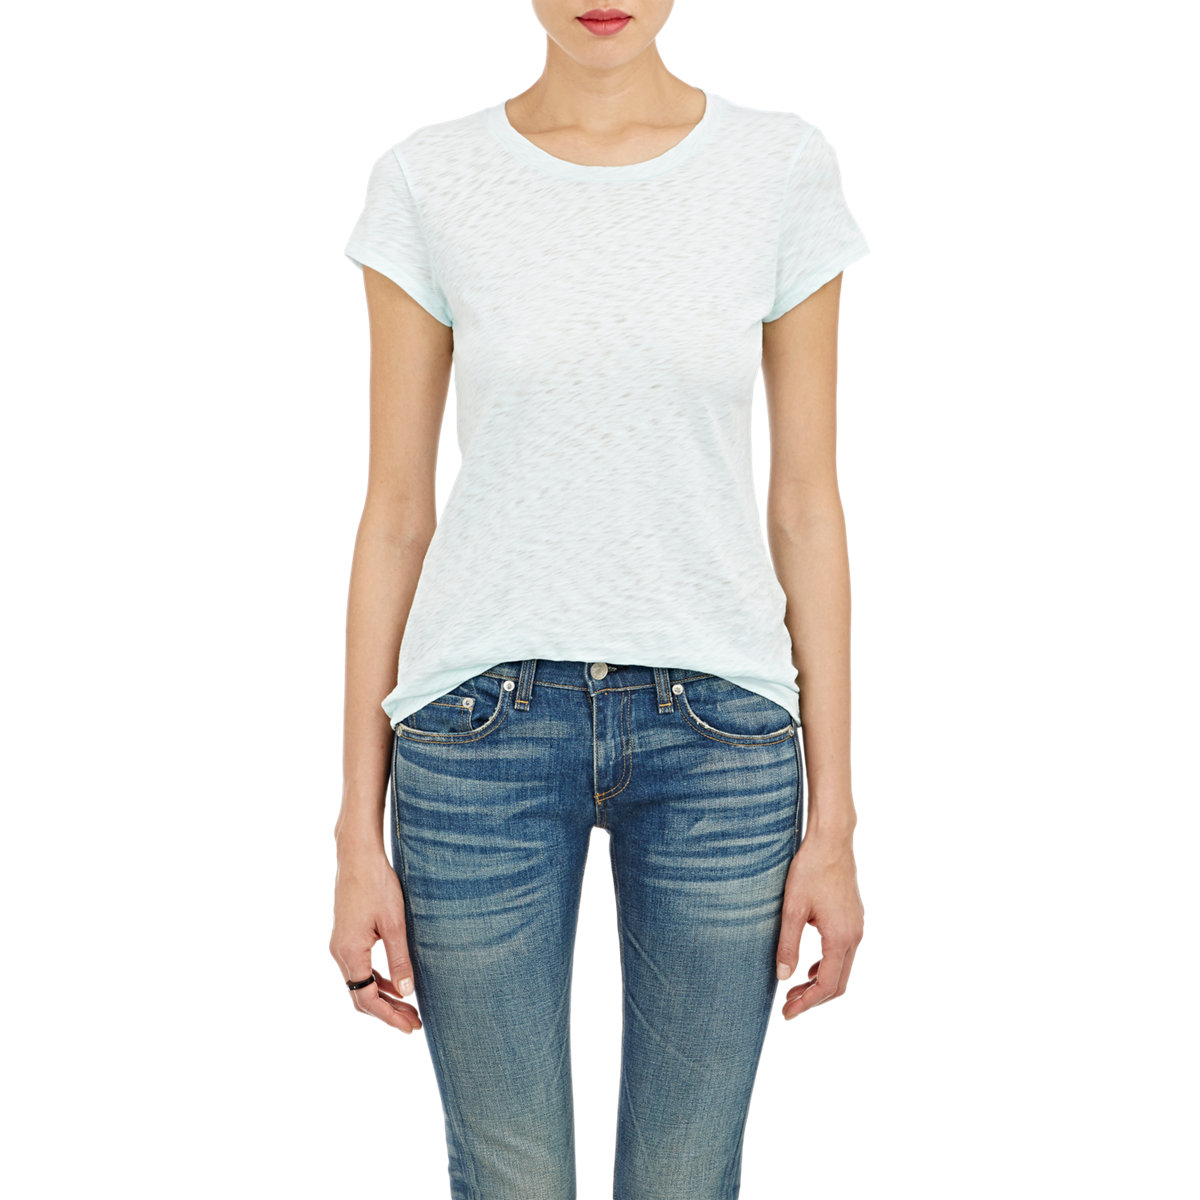 Rag bone slub jersey t shirt in white lyst for Rag bone shirt